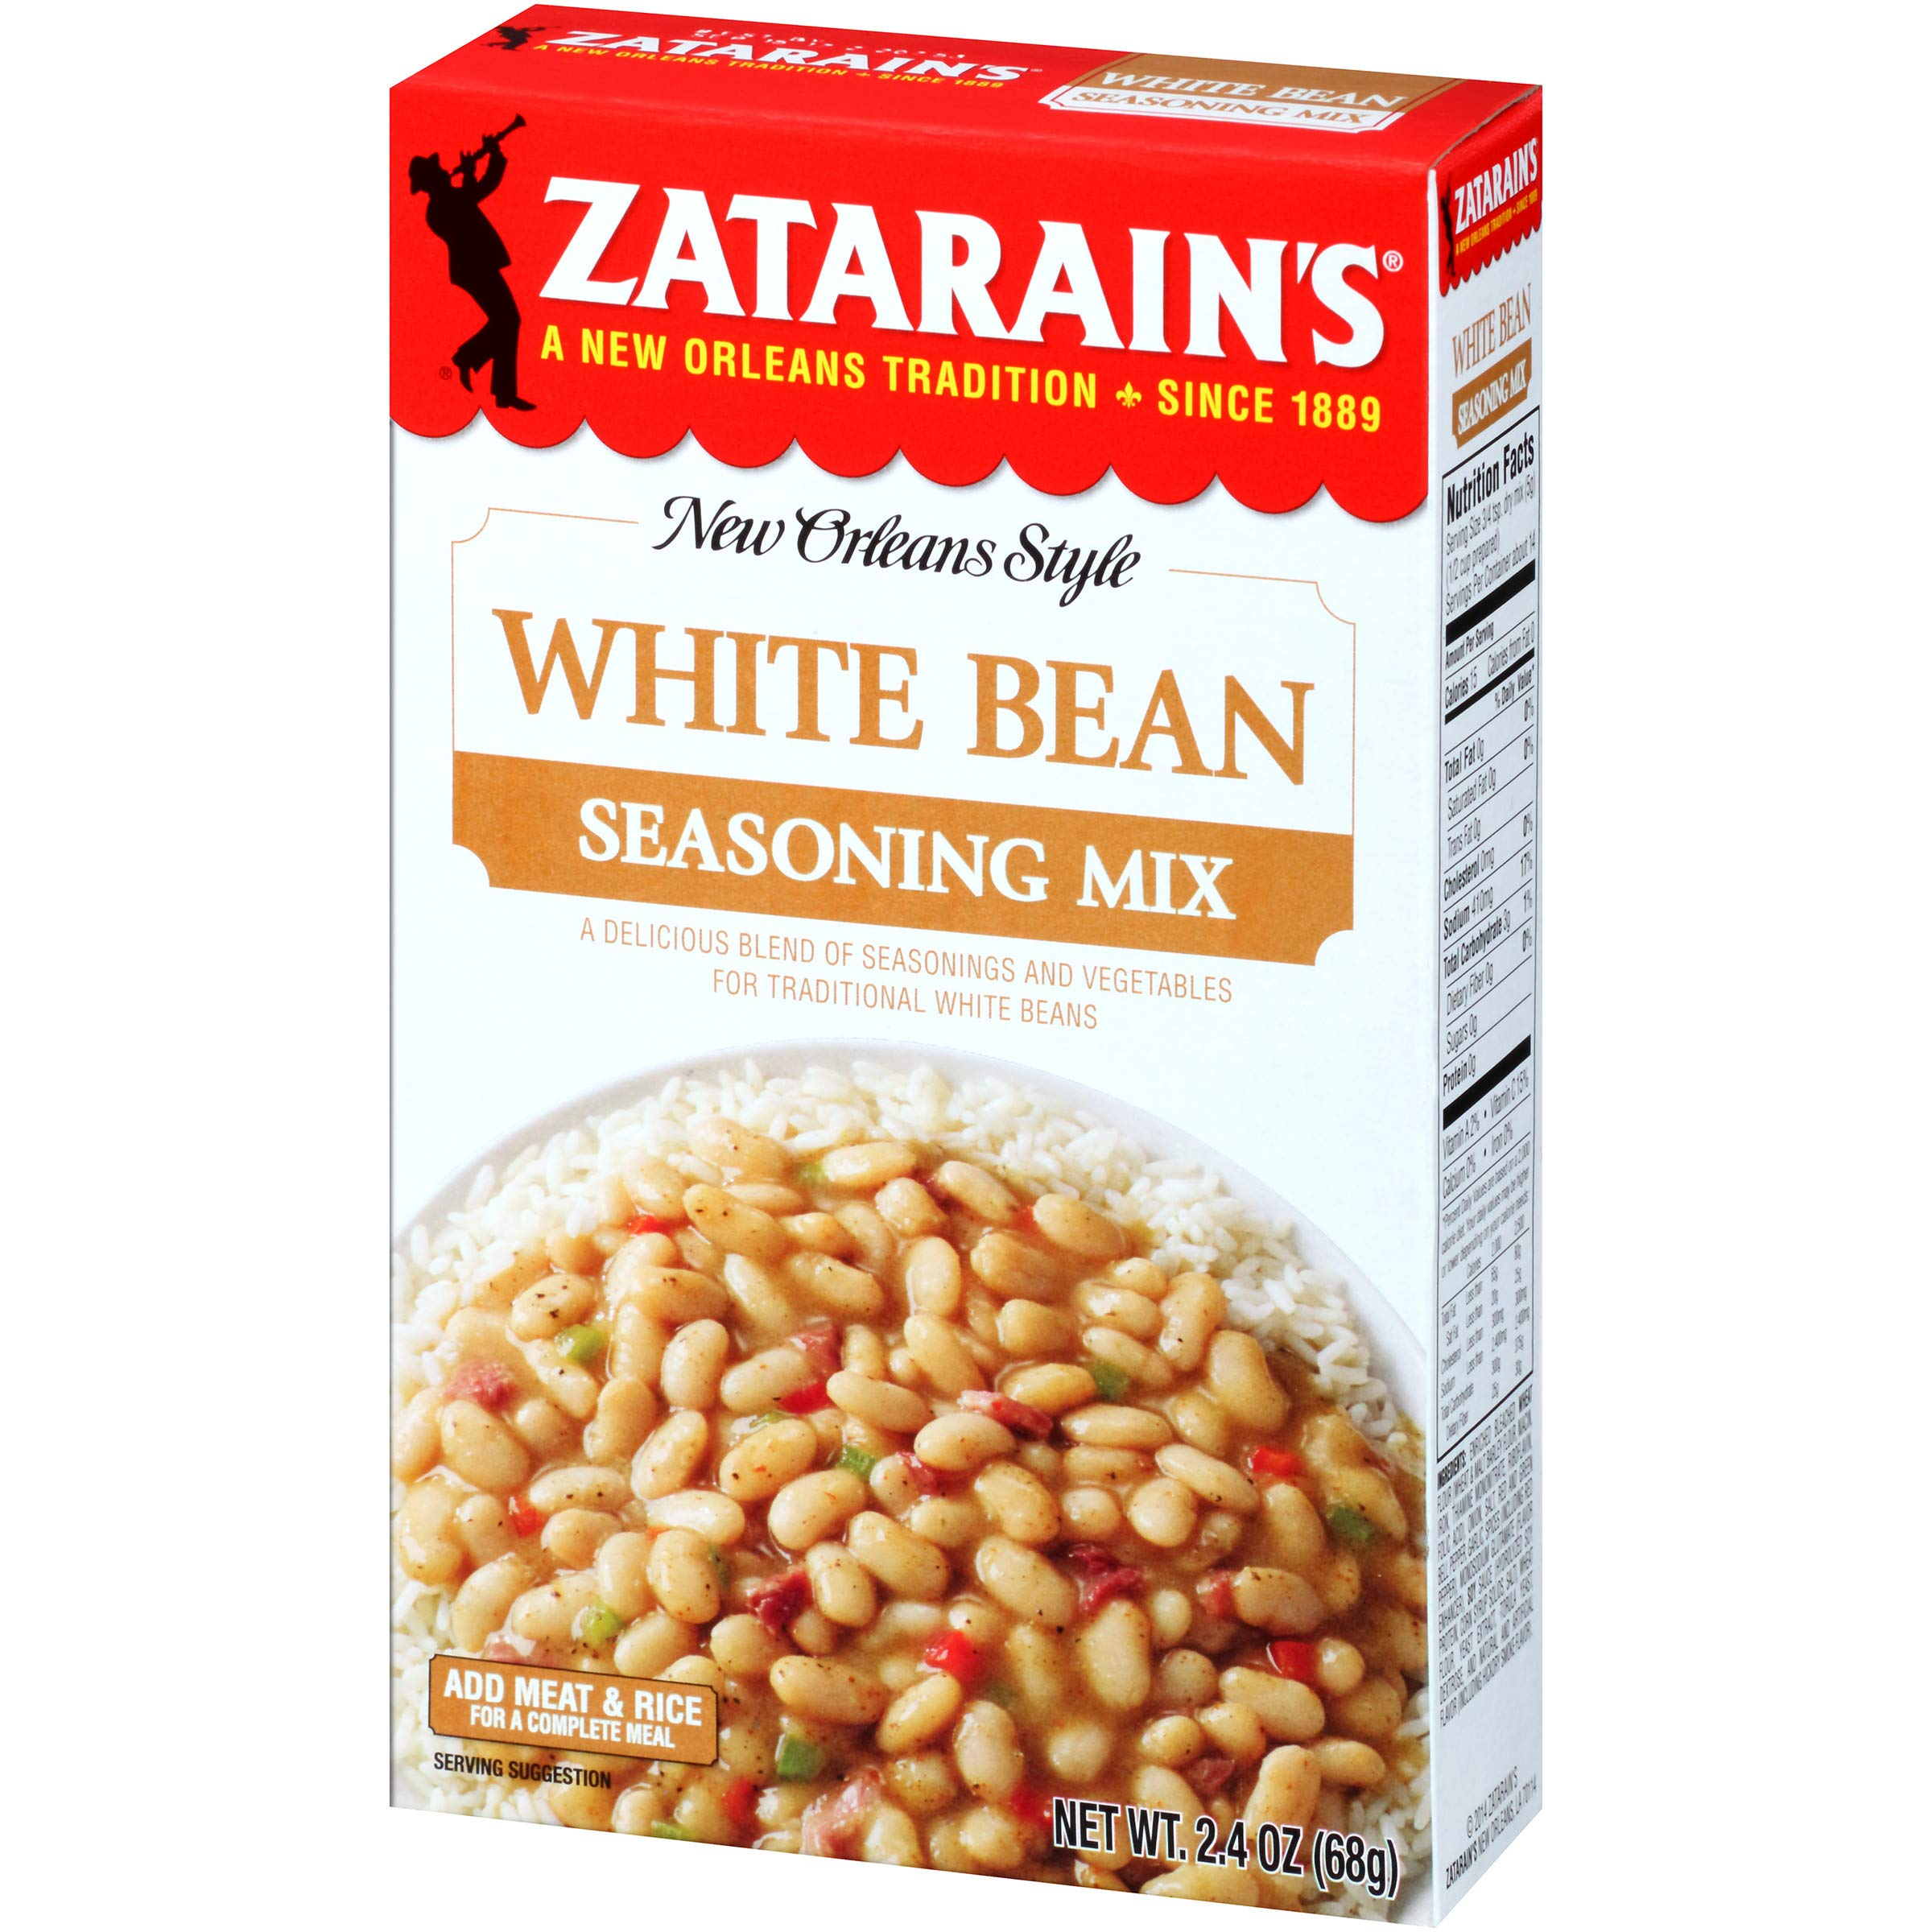 Zatarain's White Bean Seasoning Mix, 2.4 oz by Zatarain's